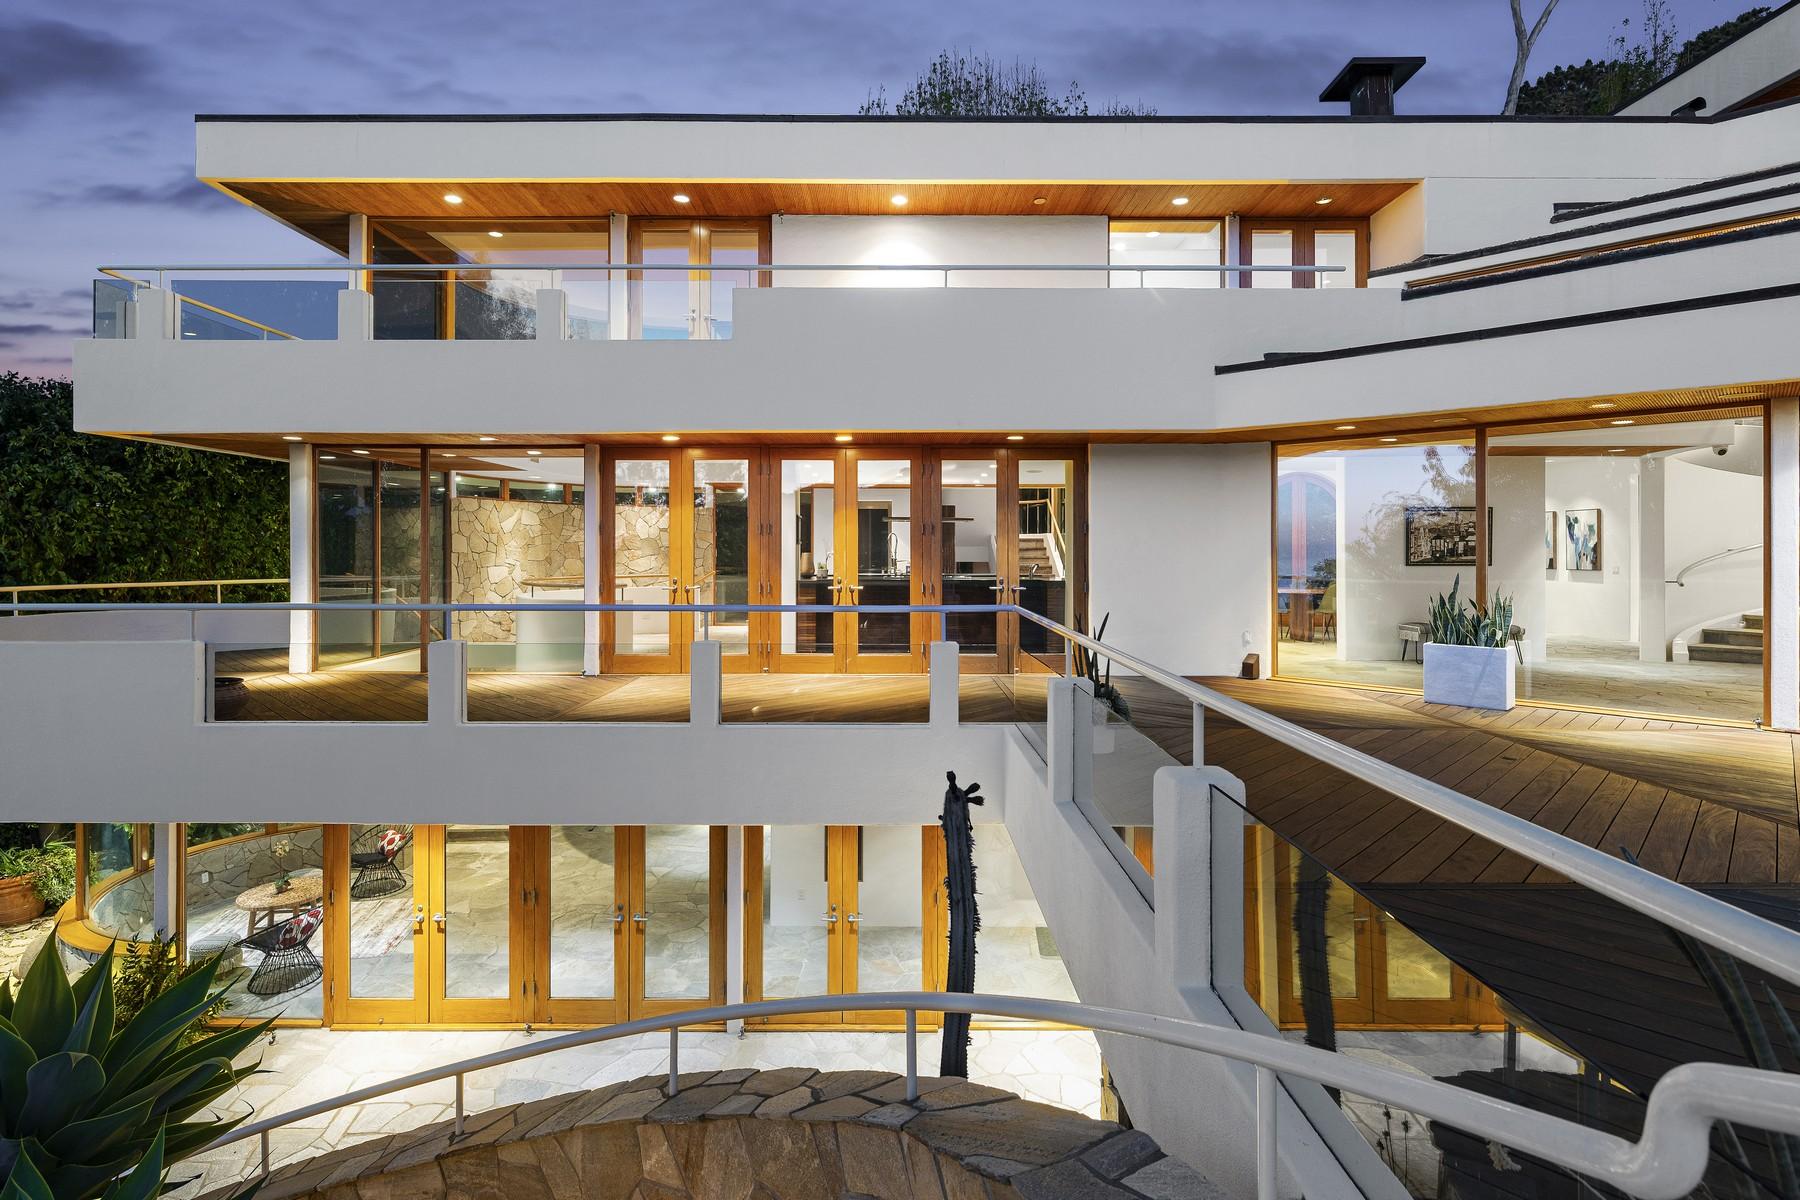 Single Family Homes for Active at 7510 Hillside Drive La Jolla, California 92037 United States